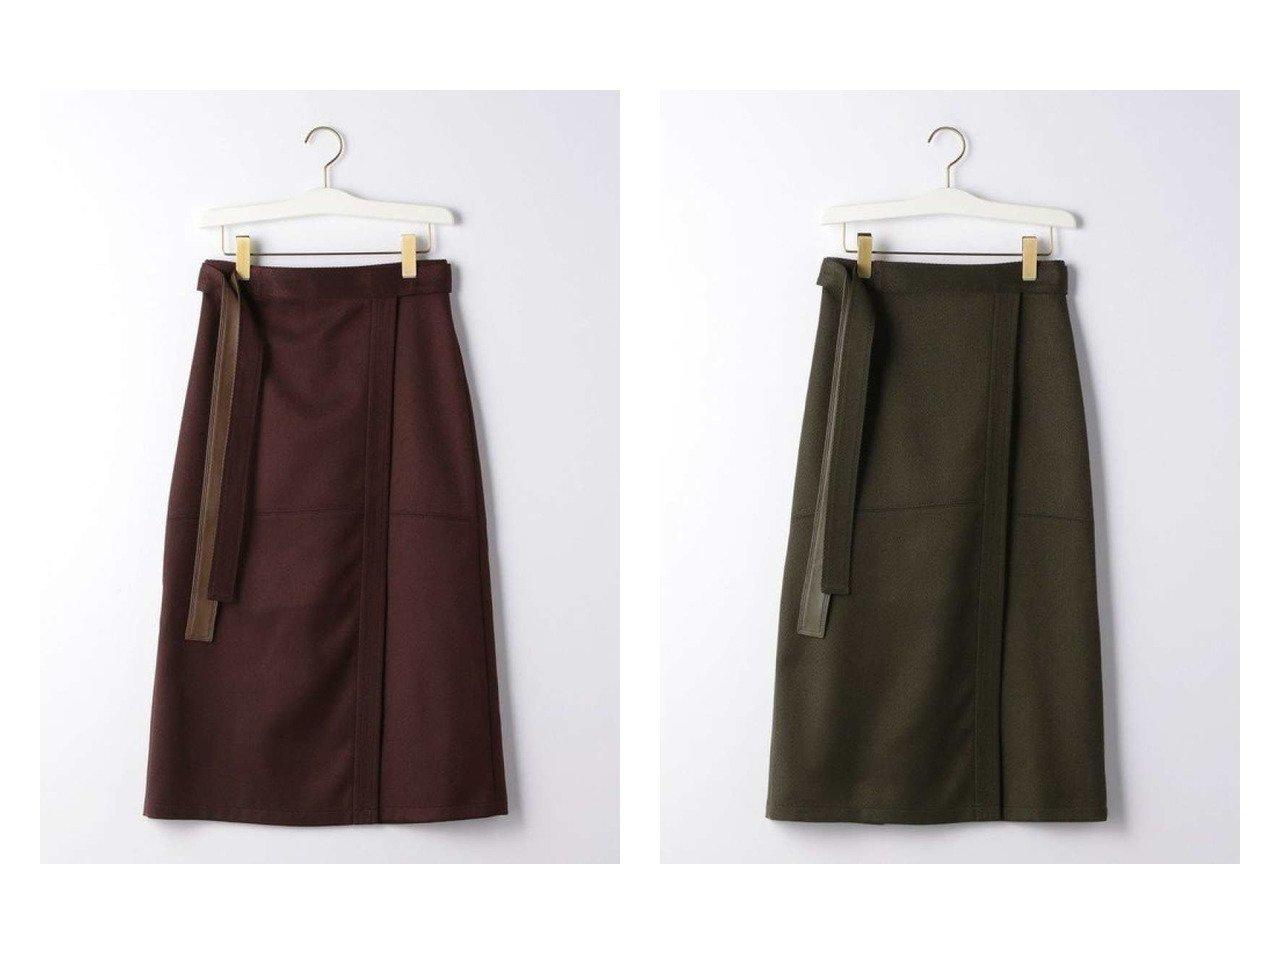 【green label relaxing / UNITED ARROWS/グリーンレーベル リラクシング / ユナイテッドアローズ】の【EMMEL REFINES】EM カルゼ ラップ 台形スカート スカートのおすすめ!人気、トレンド・レディースファッションの通販 おすすめで人気の流行・トレンド、ファッションの通販商品 メンズファッション・キッズファッション・インテリア・家具・レディースファッション・服の通販 founy(ファニー) https://founy.com/ ファッション Fashion レディースファッション WOMEN スカート Skirt ロングスカート Long Skirt 台形スカート Trapezoid Skirt 秋 Autumn/Fall 台形 ラップ ロング 冬 Winter  ID:crp329100000012431